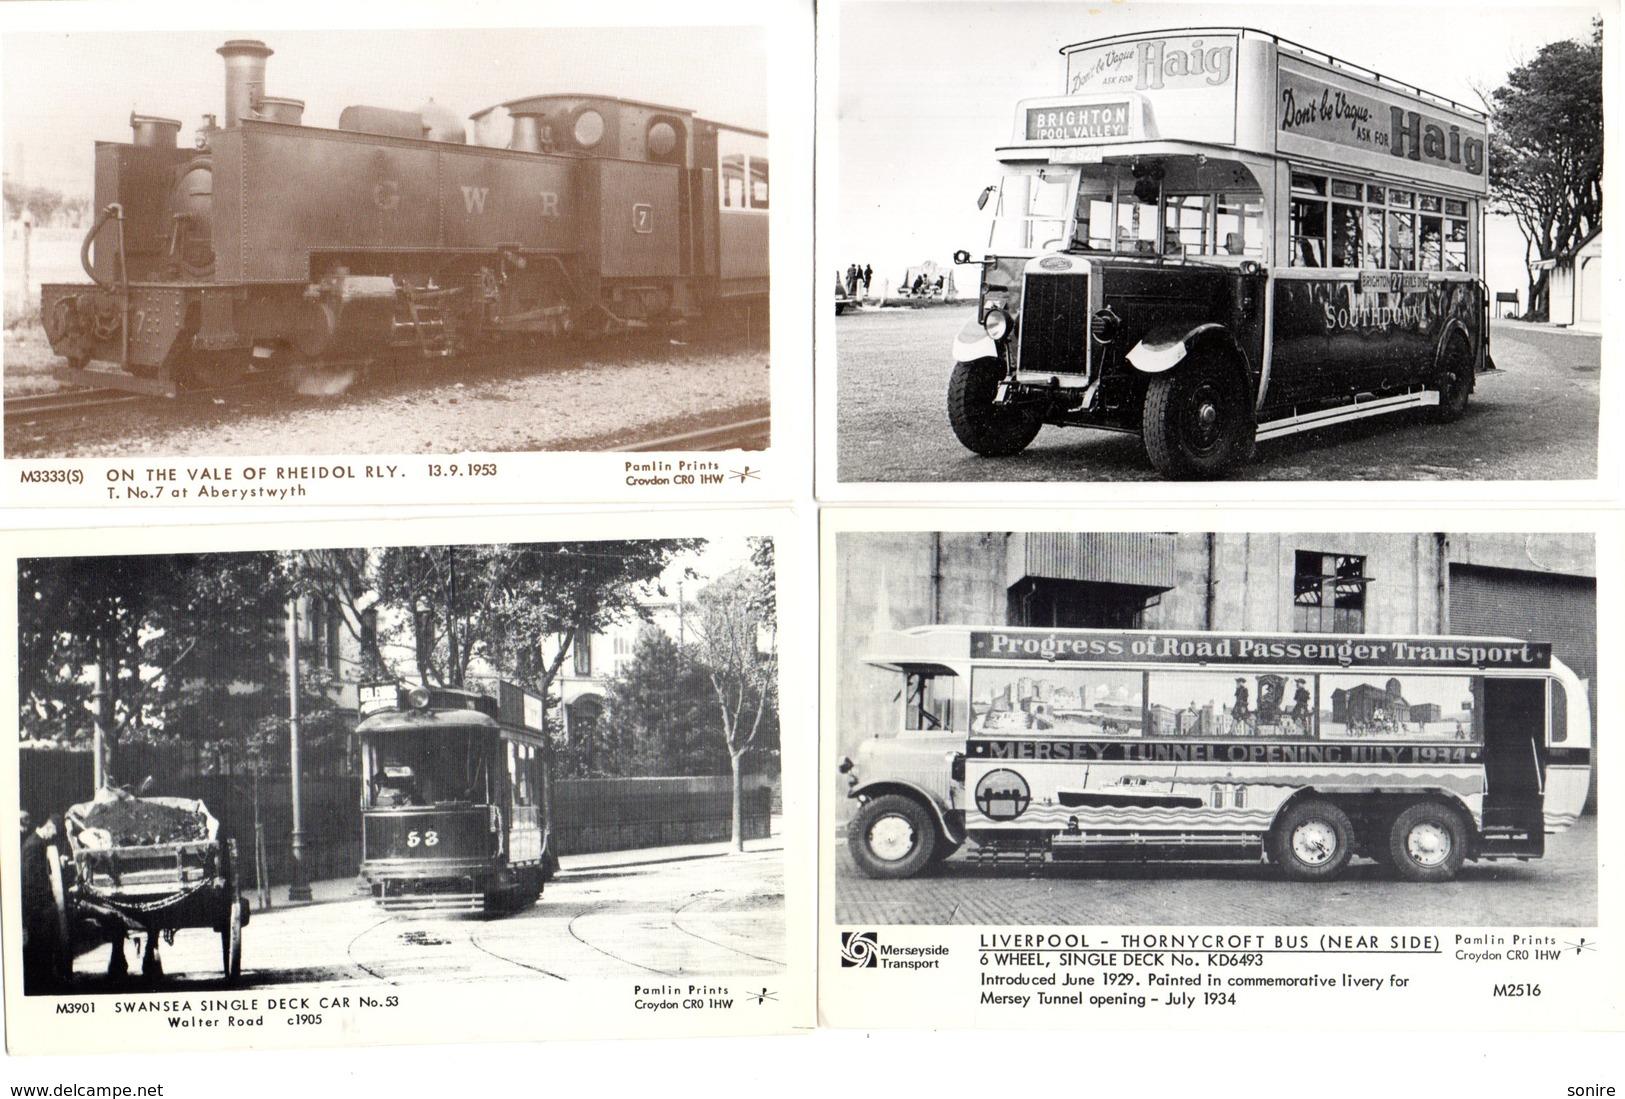 4 OLD POSTCARDS BUS COACHES PAMLIN PRINTS - Postcards